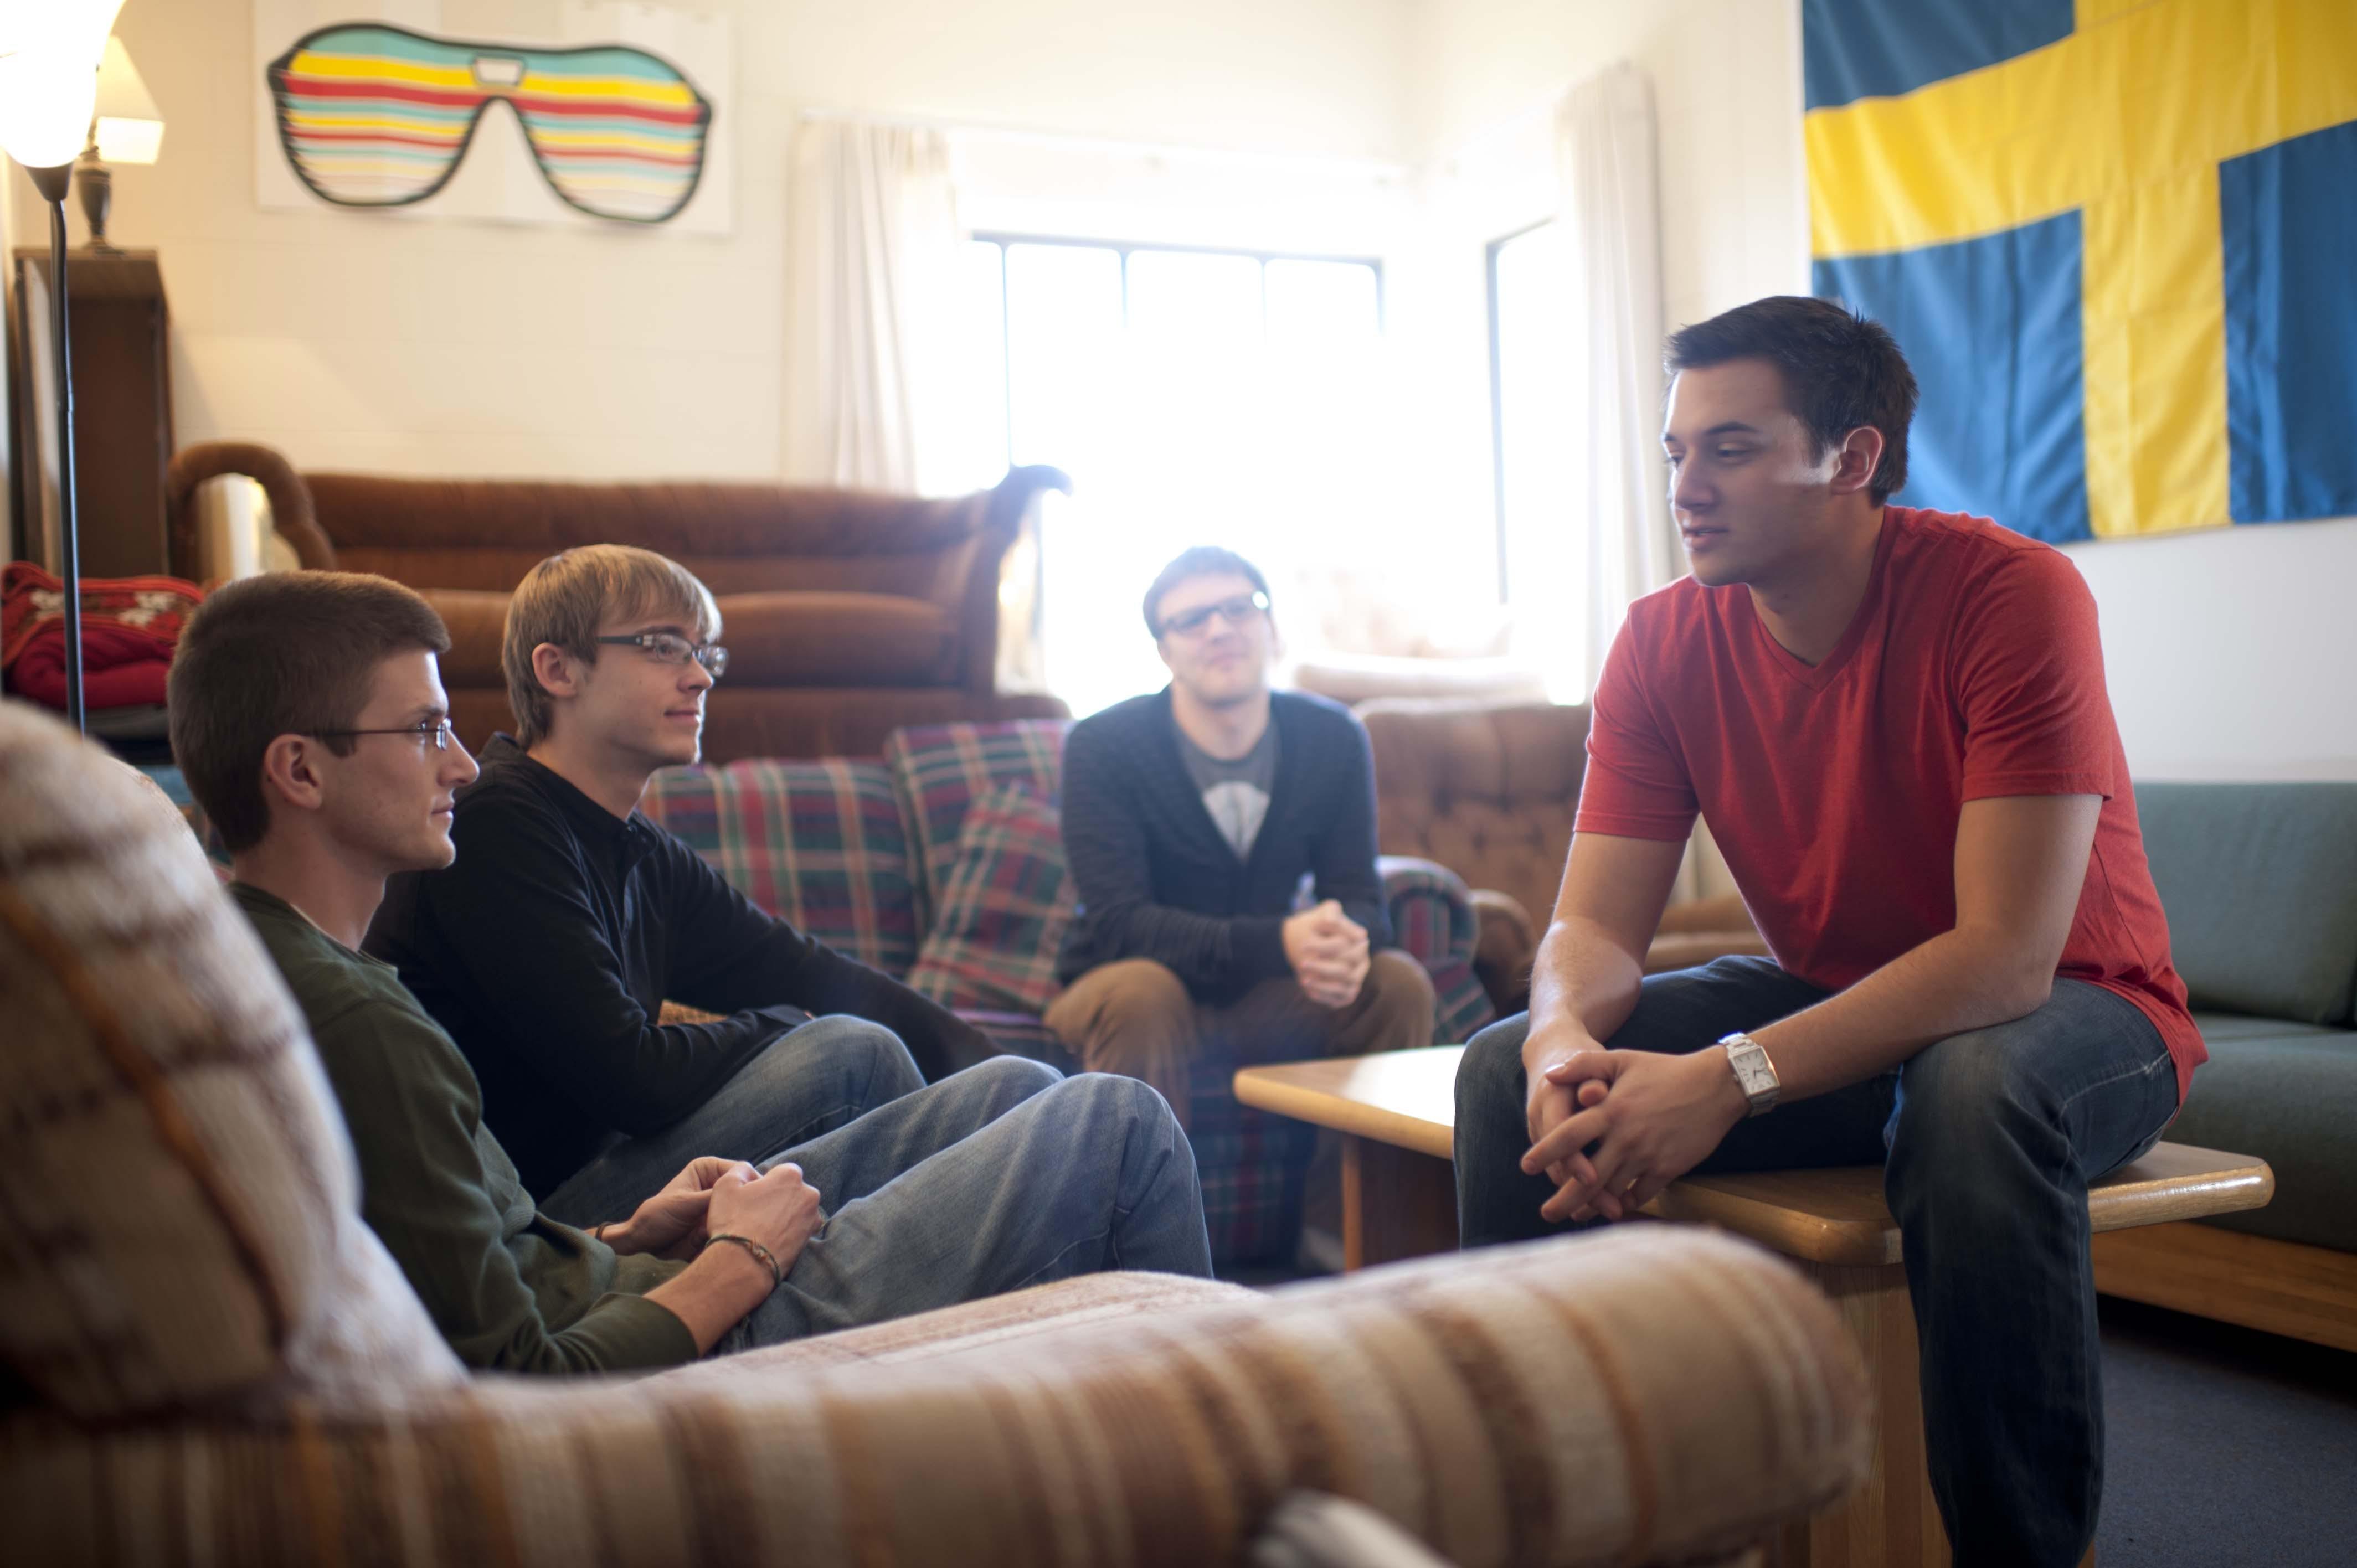 Bethel students talk in their dorm room